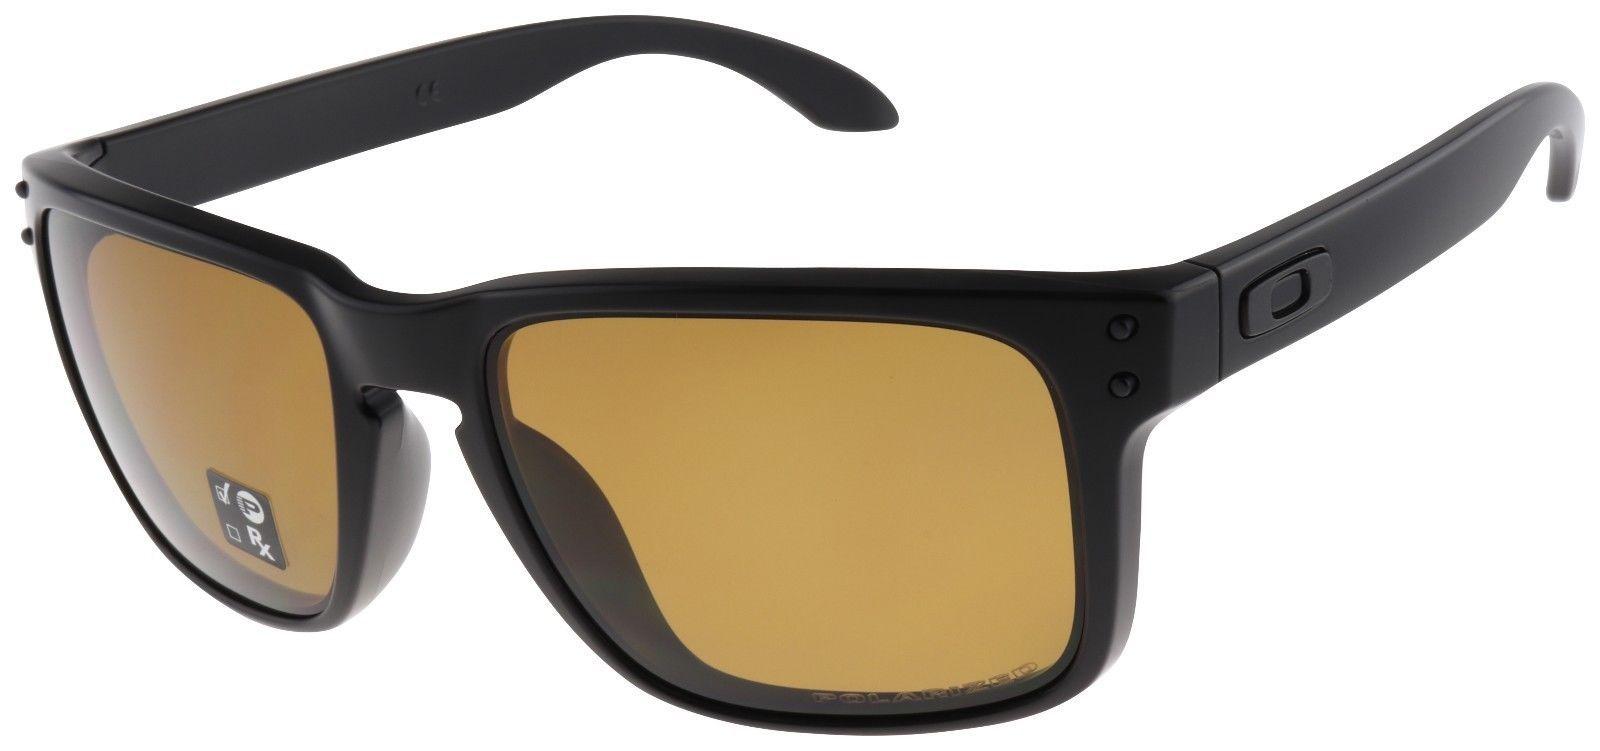 d863fab8f0 Oakley Holbrook Sunglasses OO9102-98 Matte Black